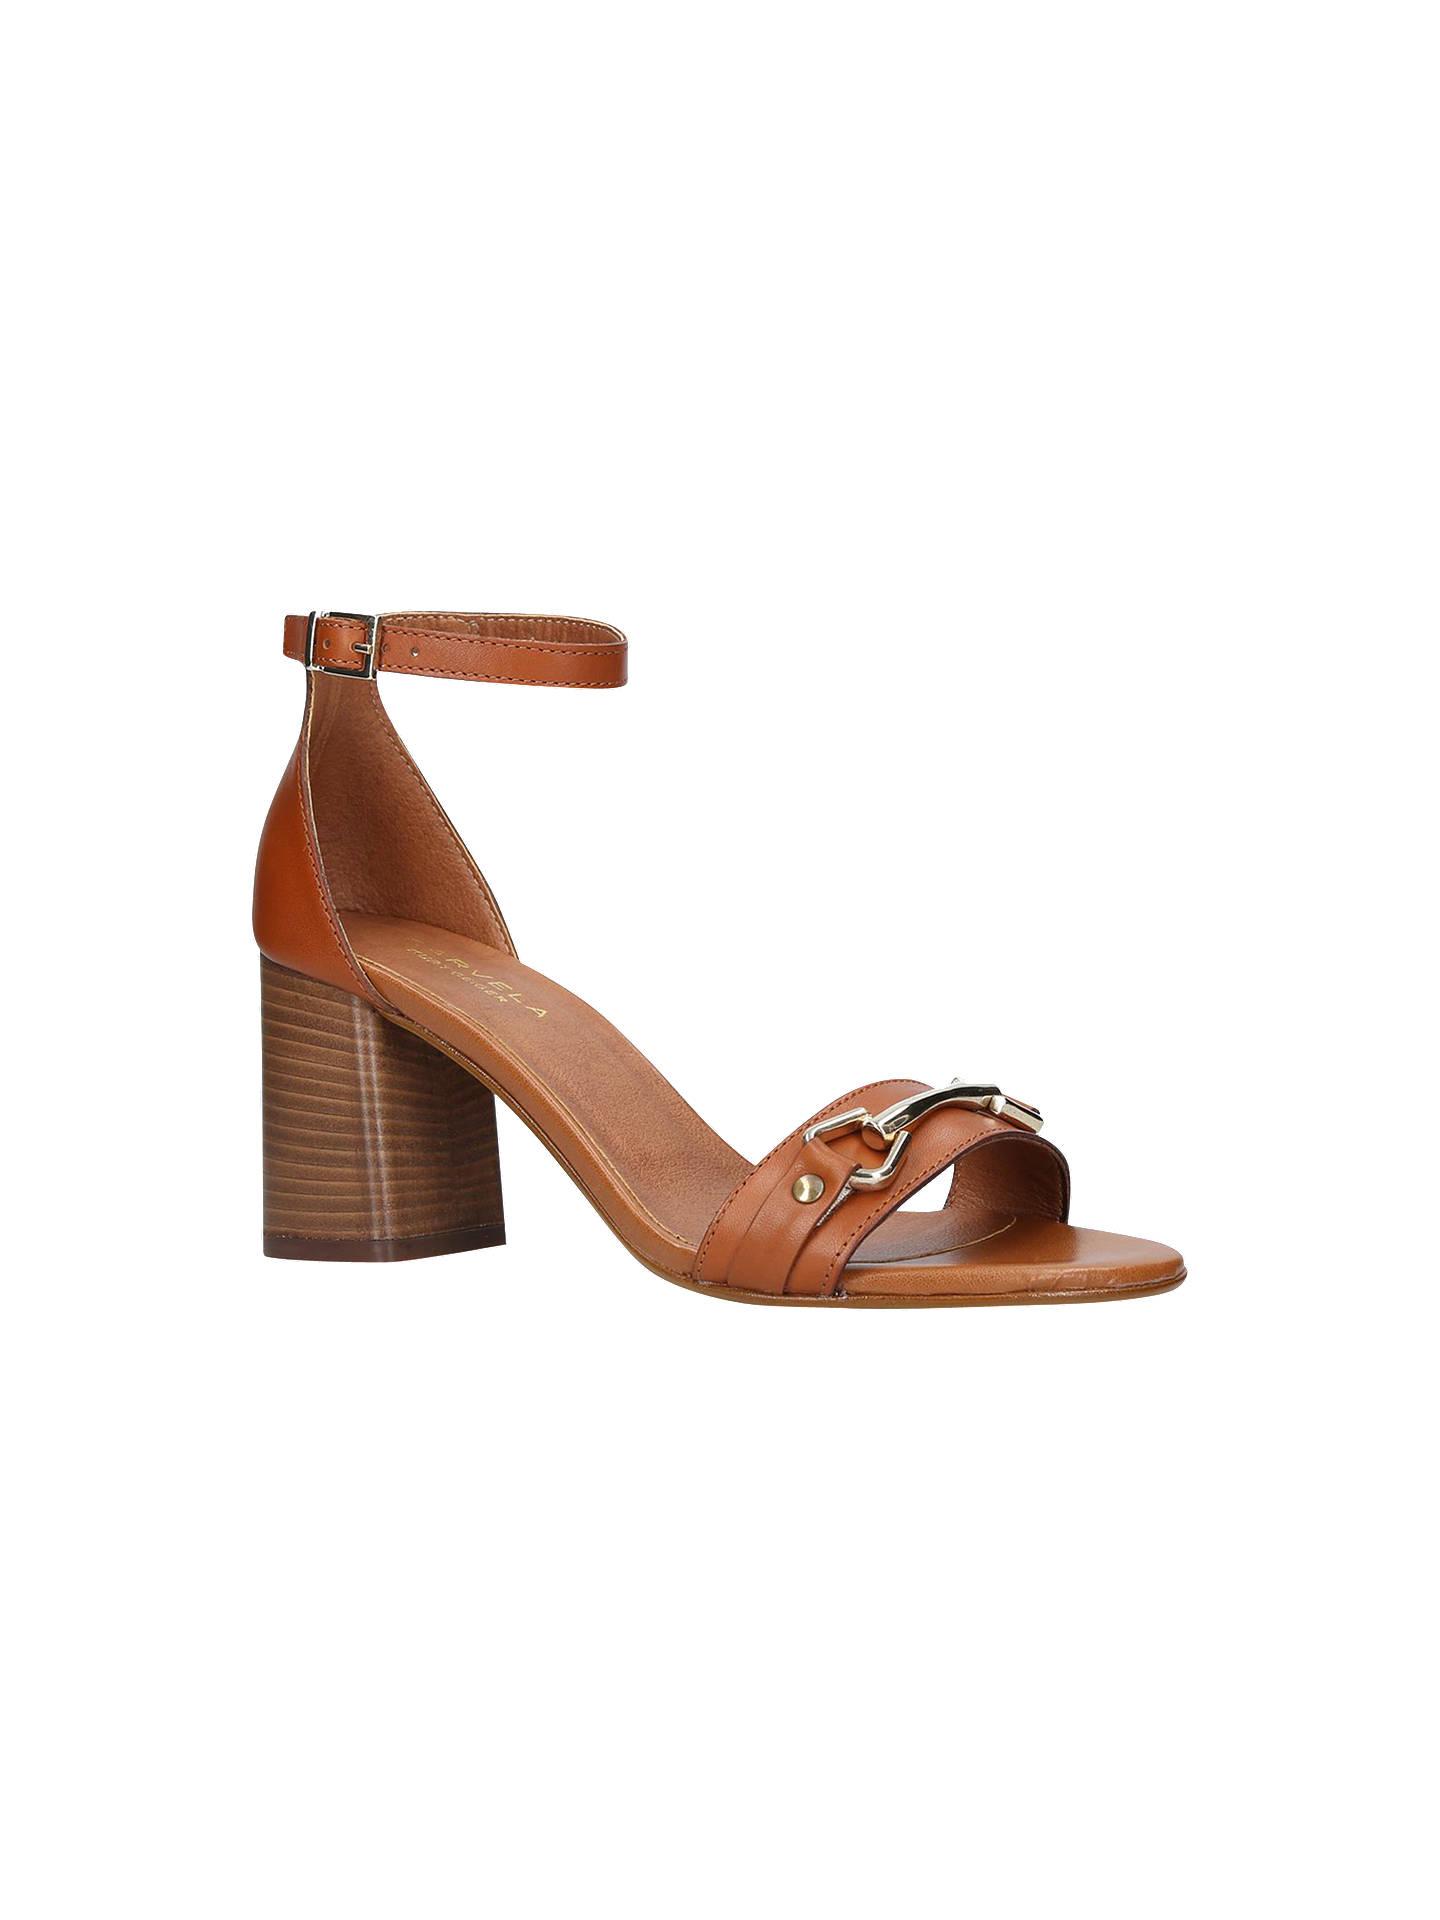 d5f68d2f5 ... Buy Carvela Kast Block Heel Sandals